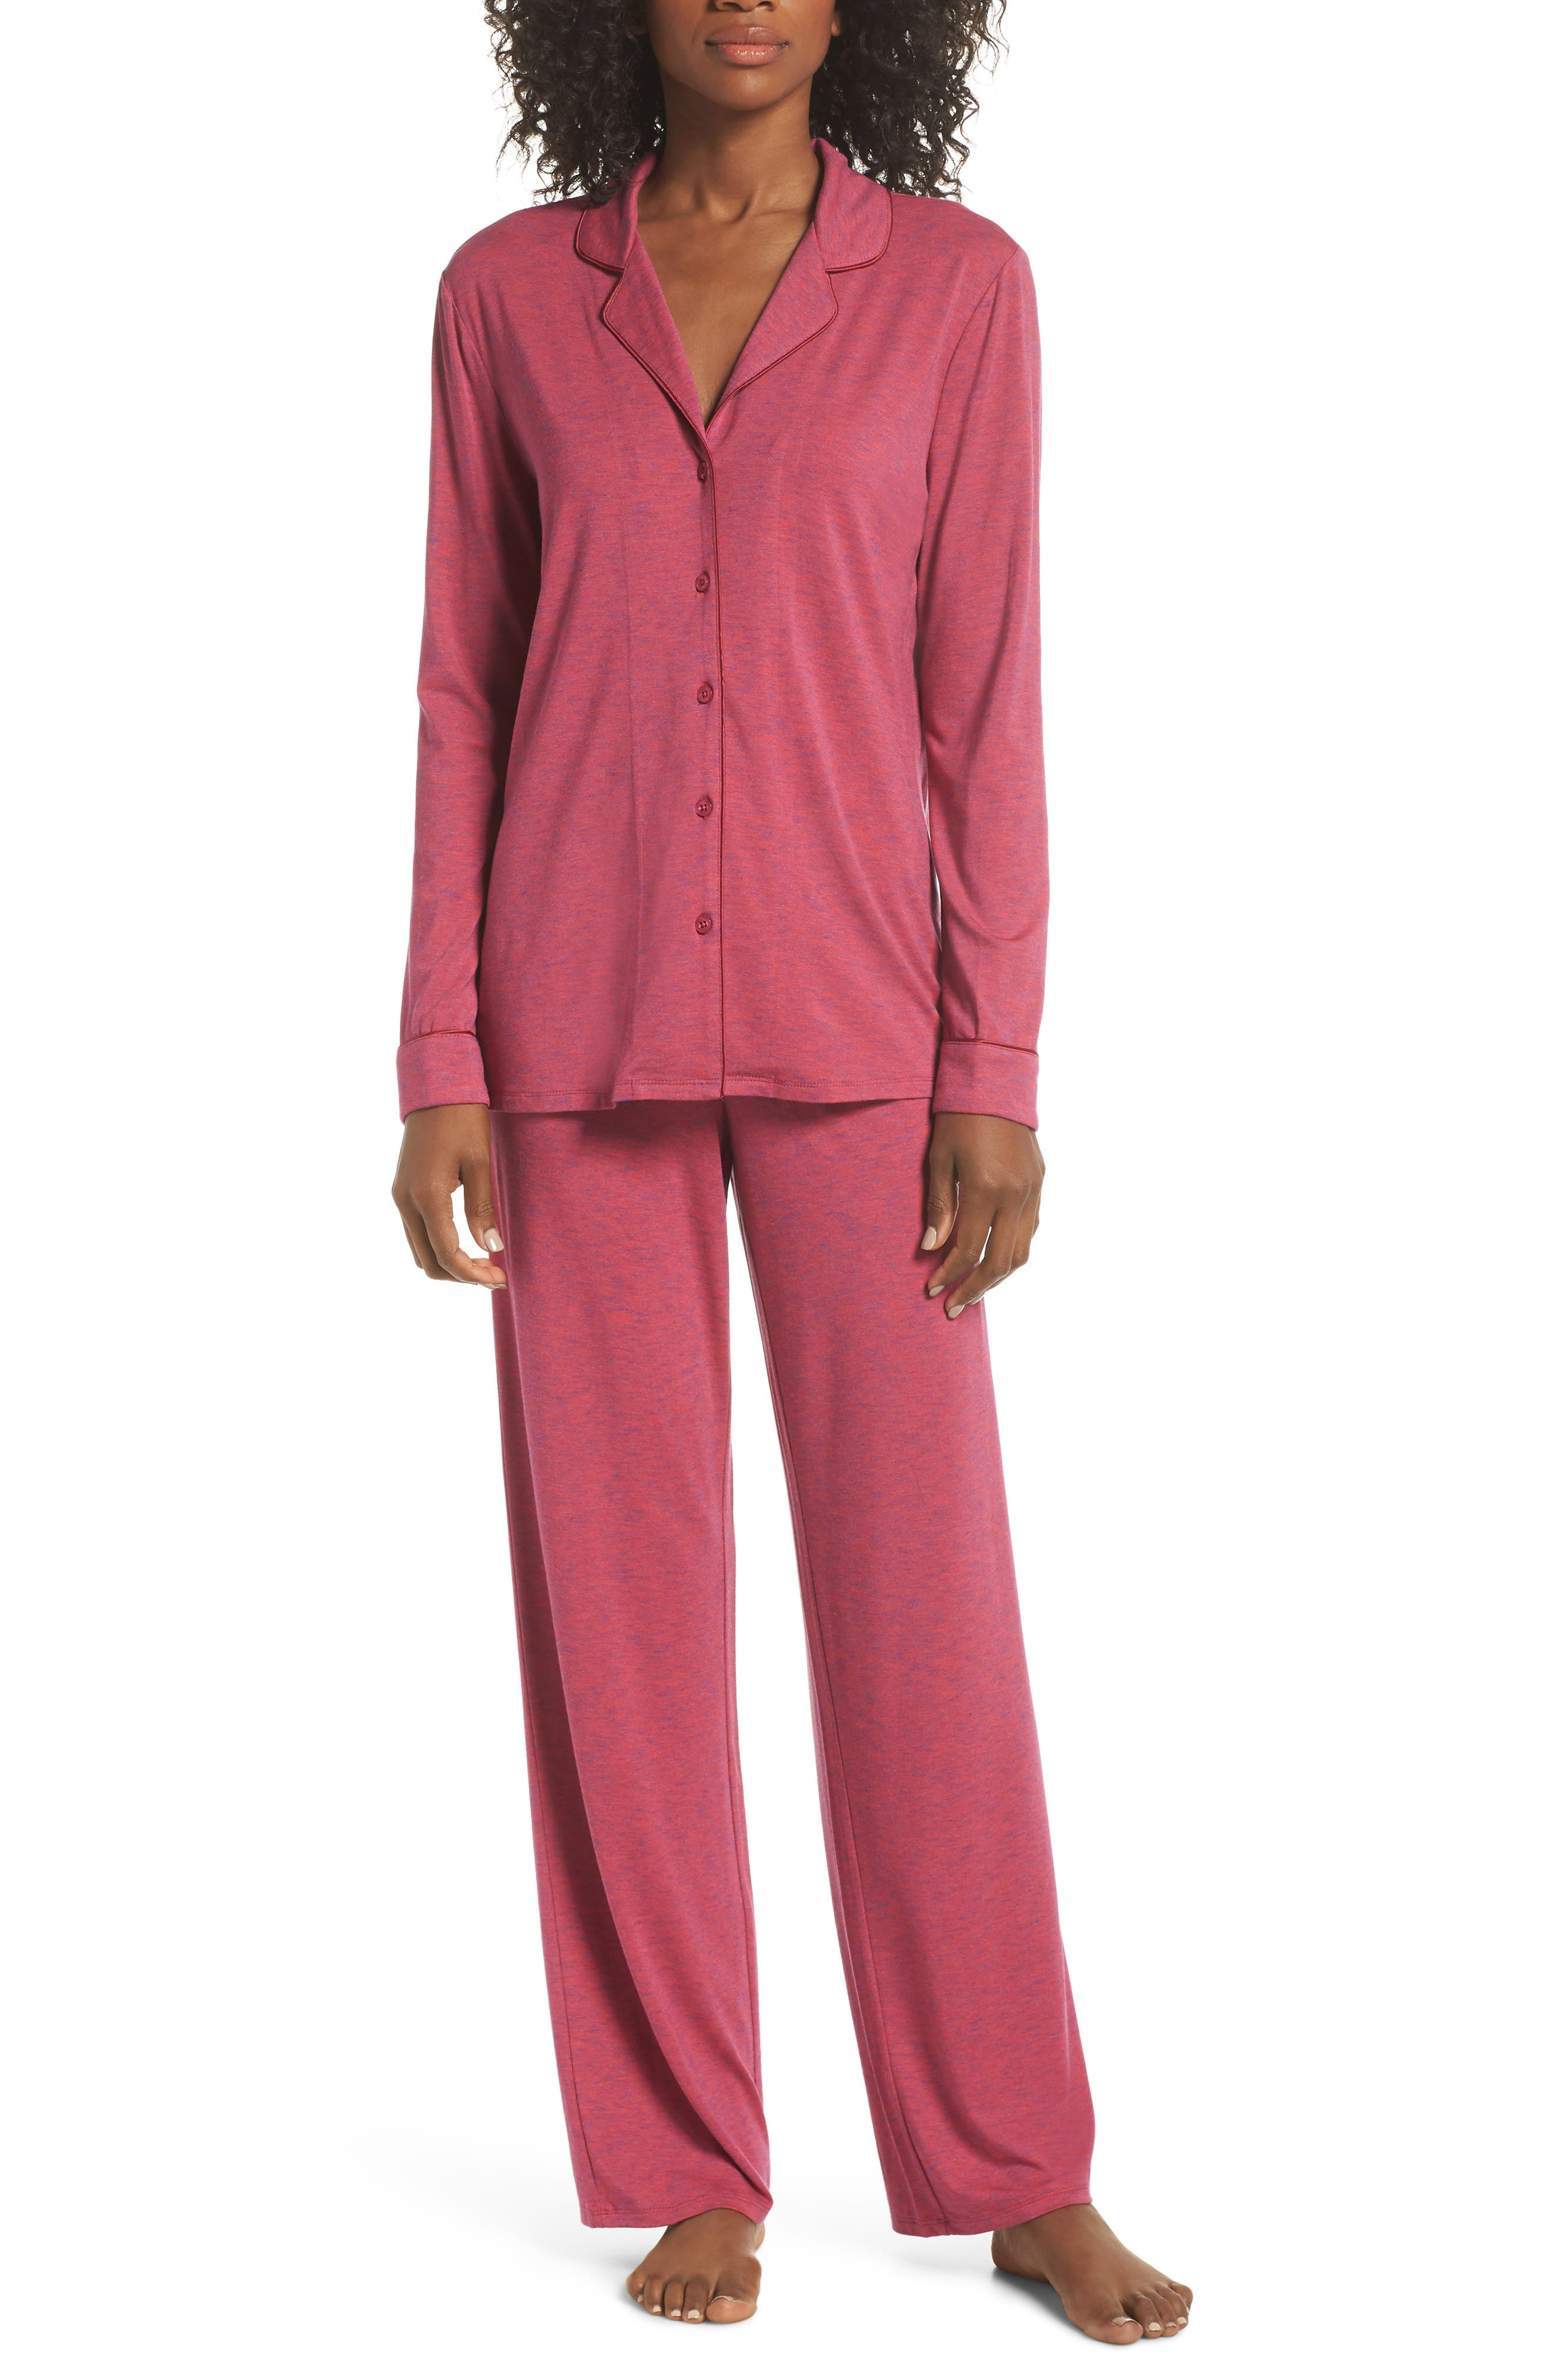 Nordstrom Lingerie Moonlight Pajamas, Burgundy